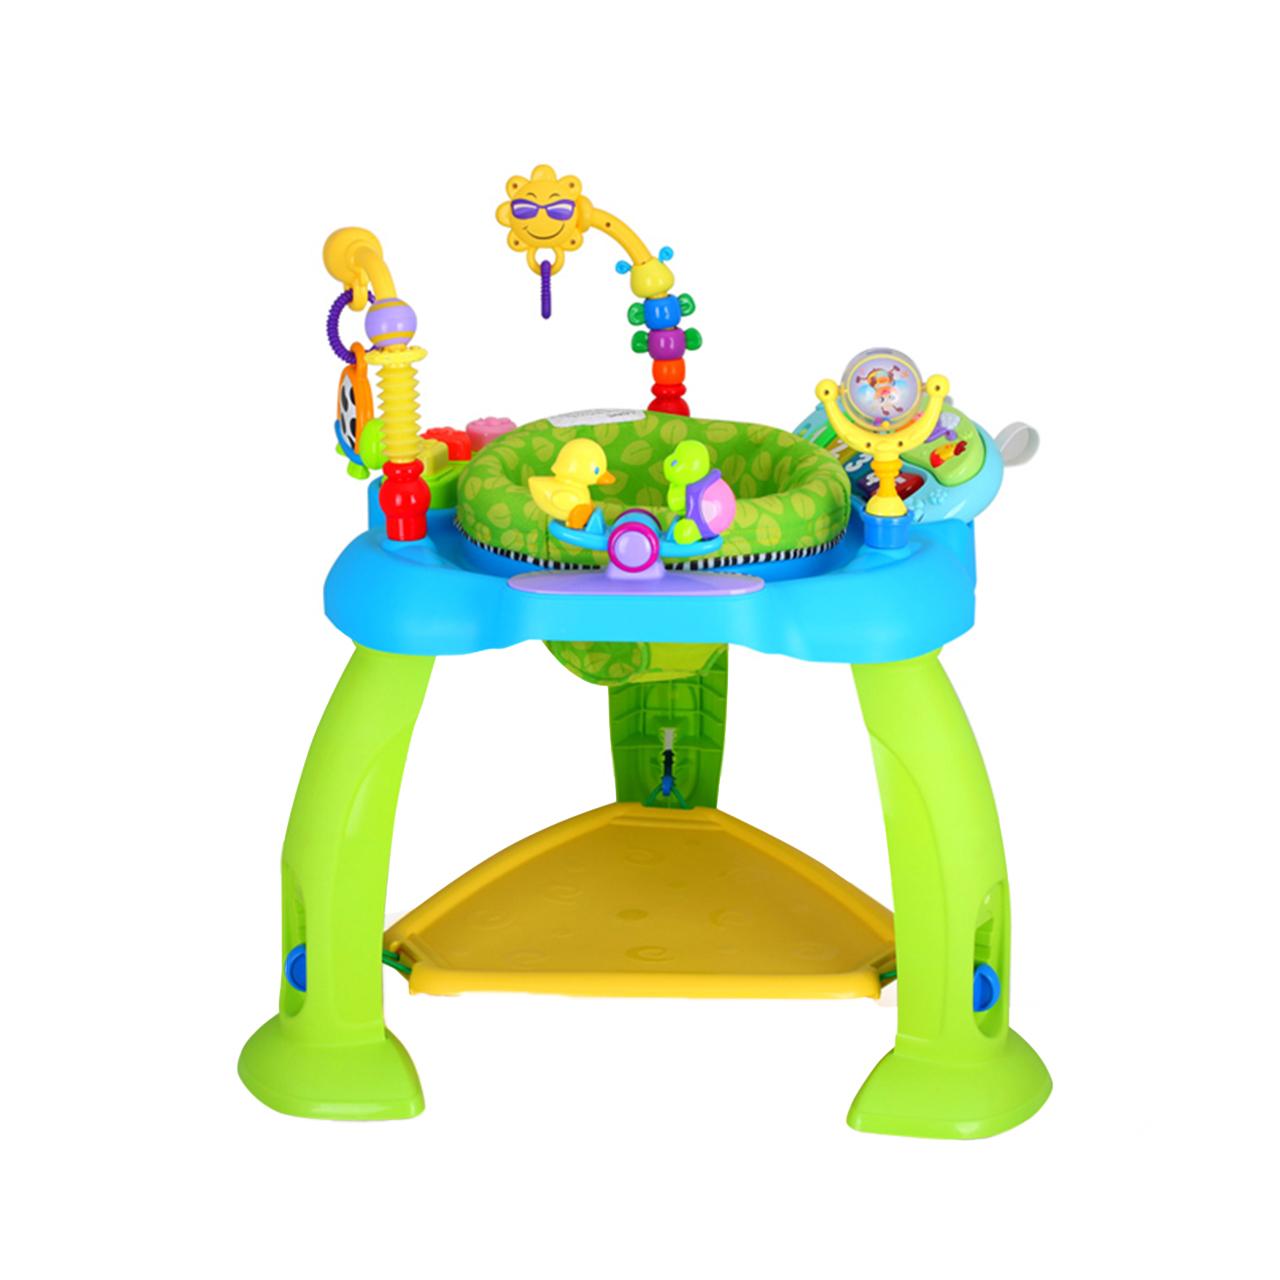 صندلی کودک هولی تویز مدل jumping Chair 9439